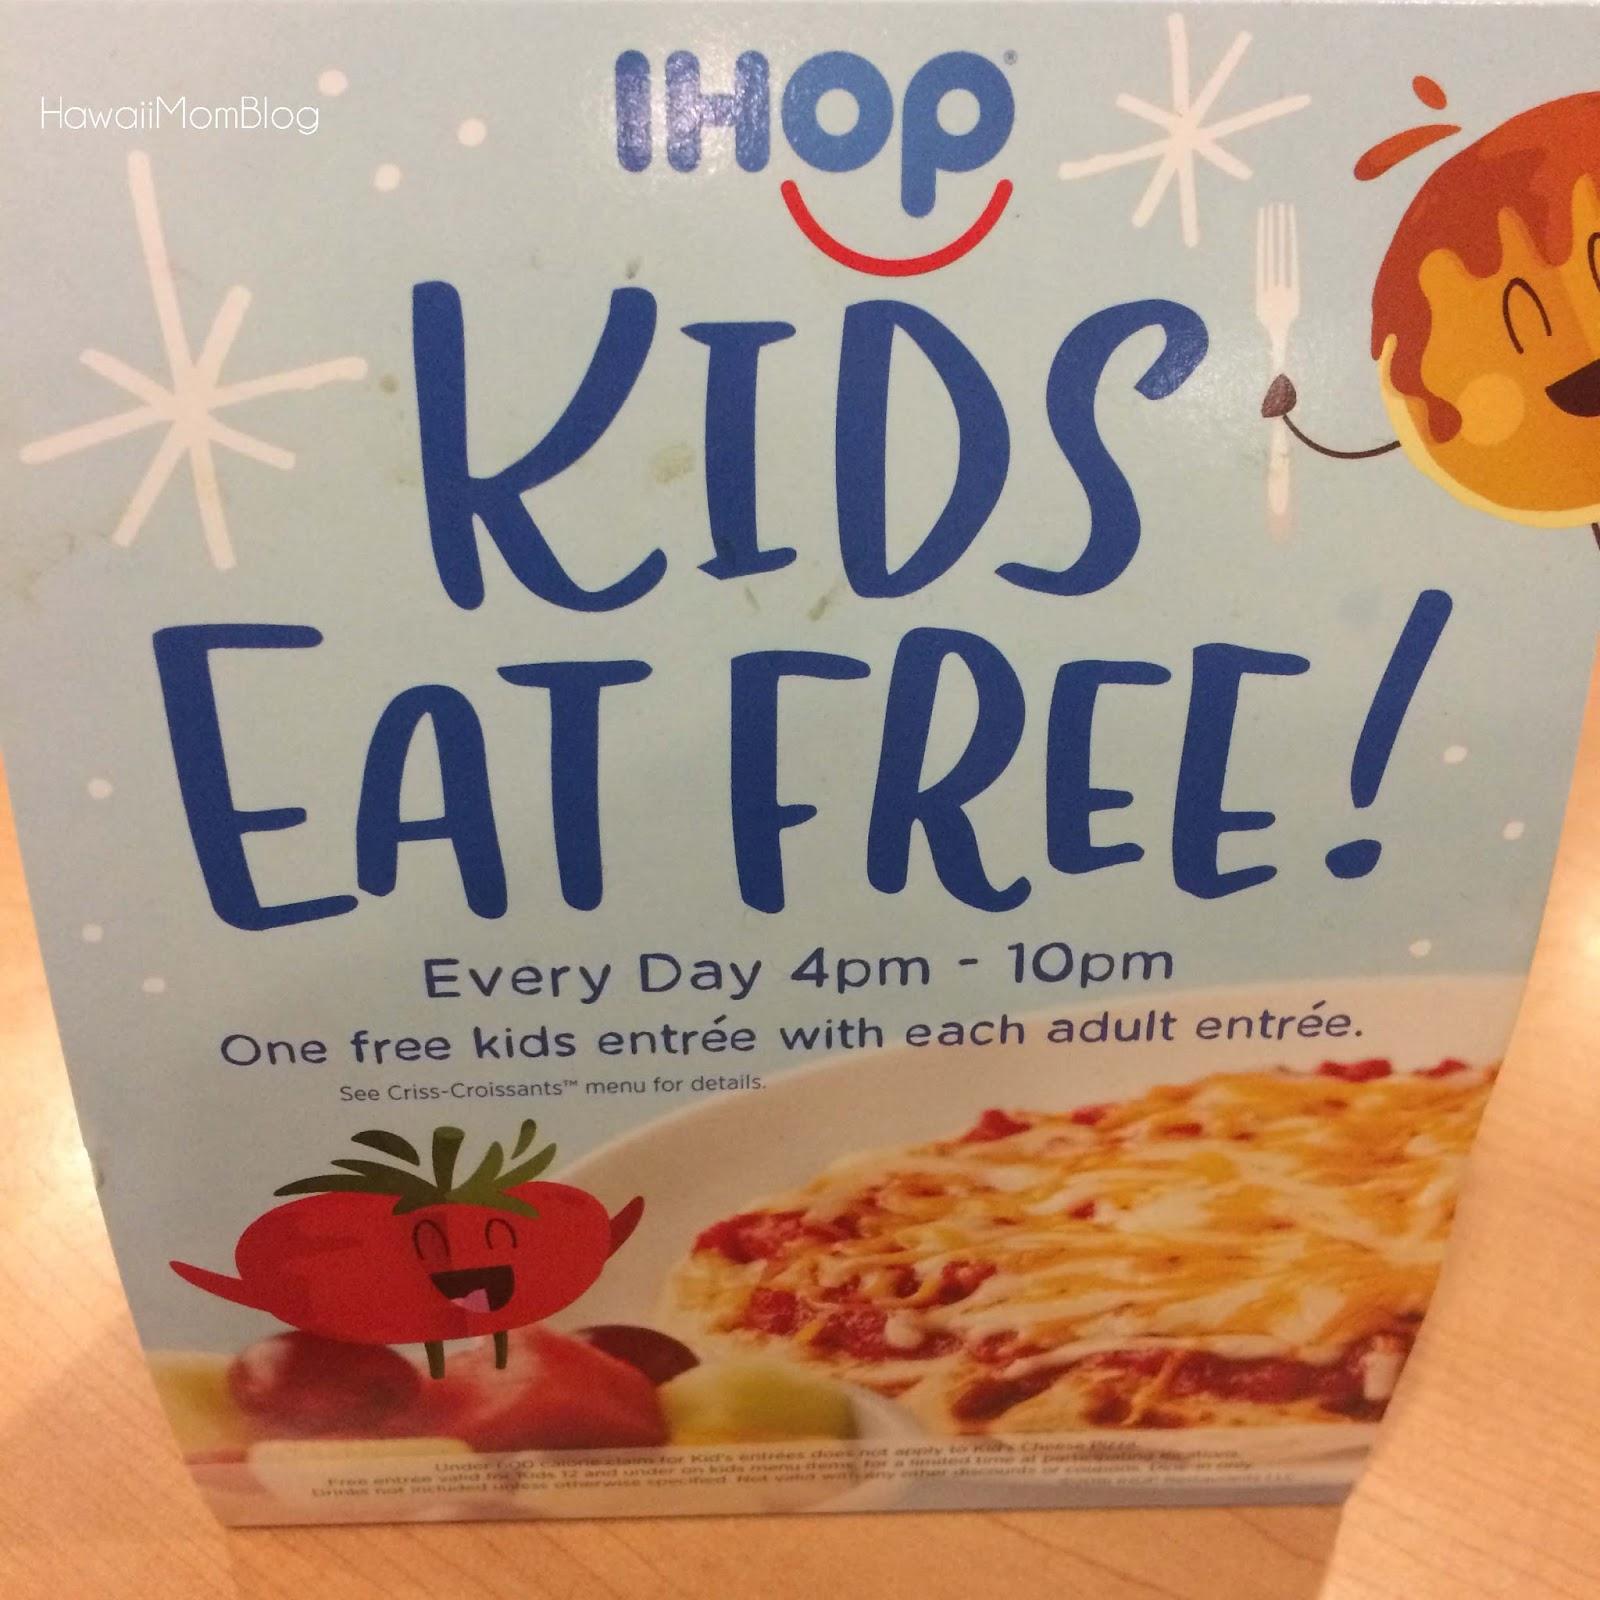 hawaii mom blog: kids eat free at ihop through september 25